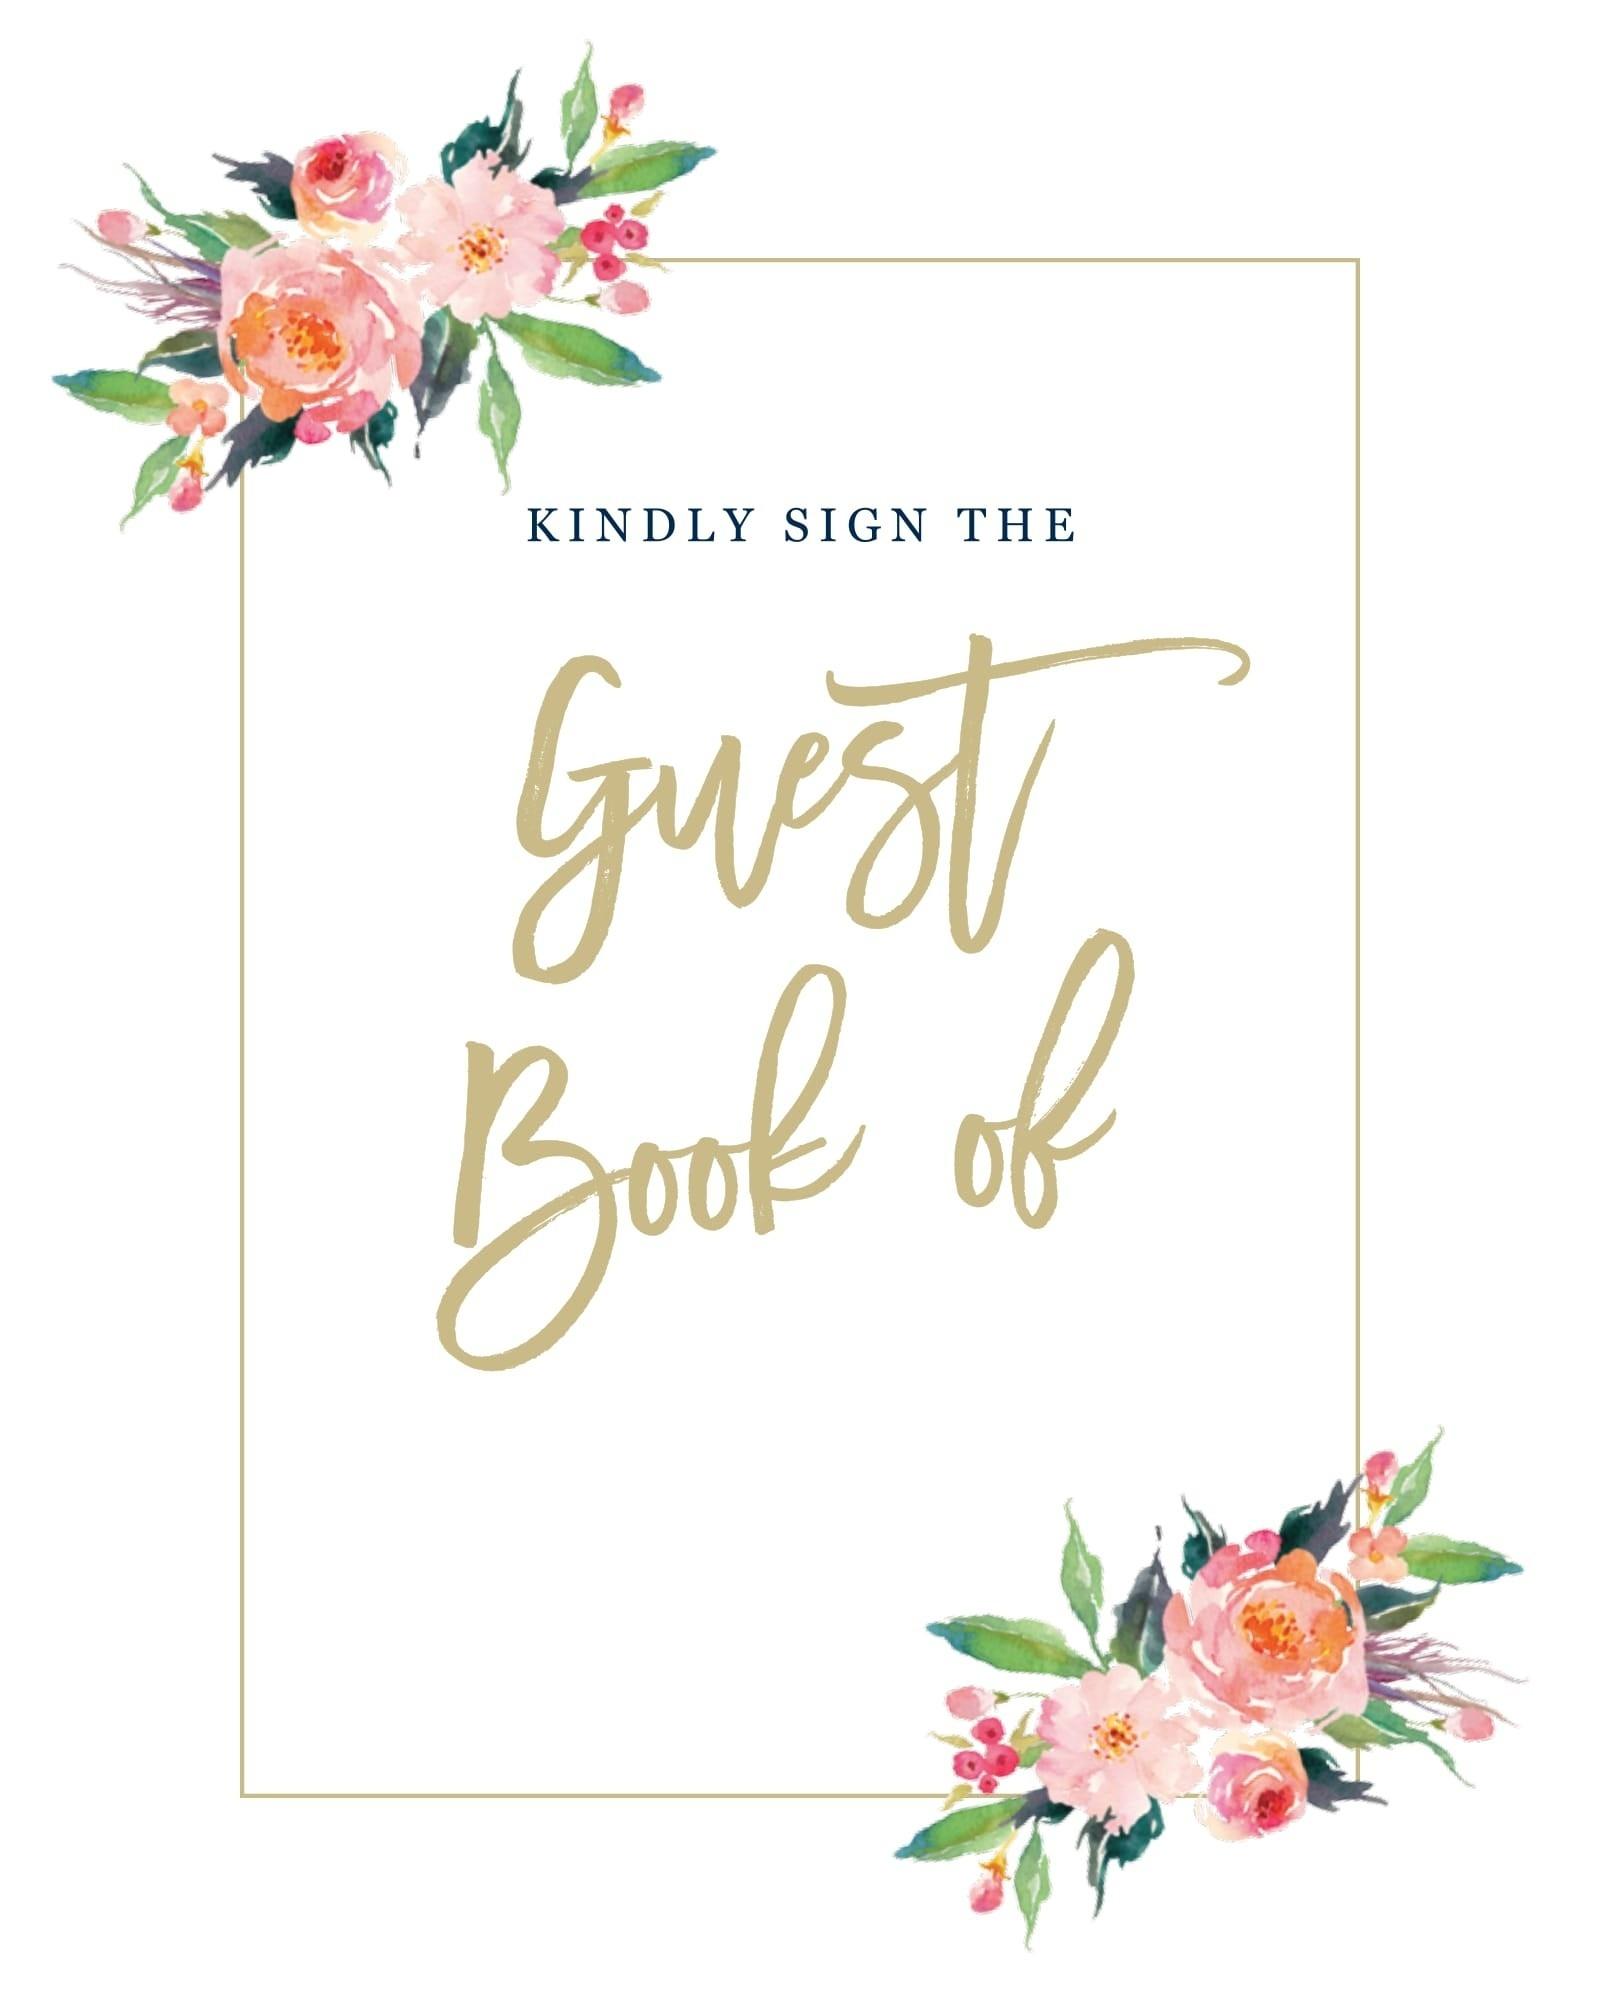 Wedding Printables And Free Wedding Templates | Basic Invite - Free Printable Bridal Shower Cards